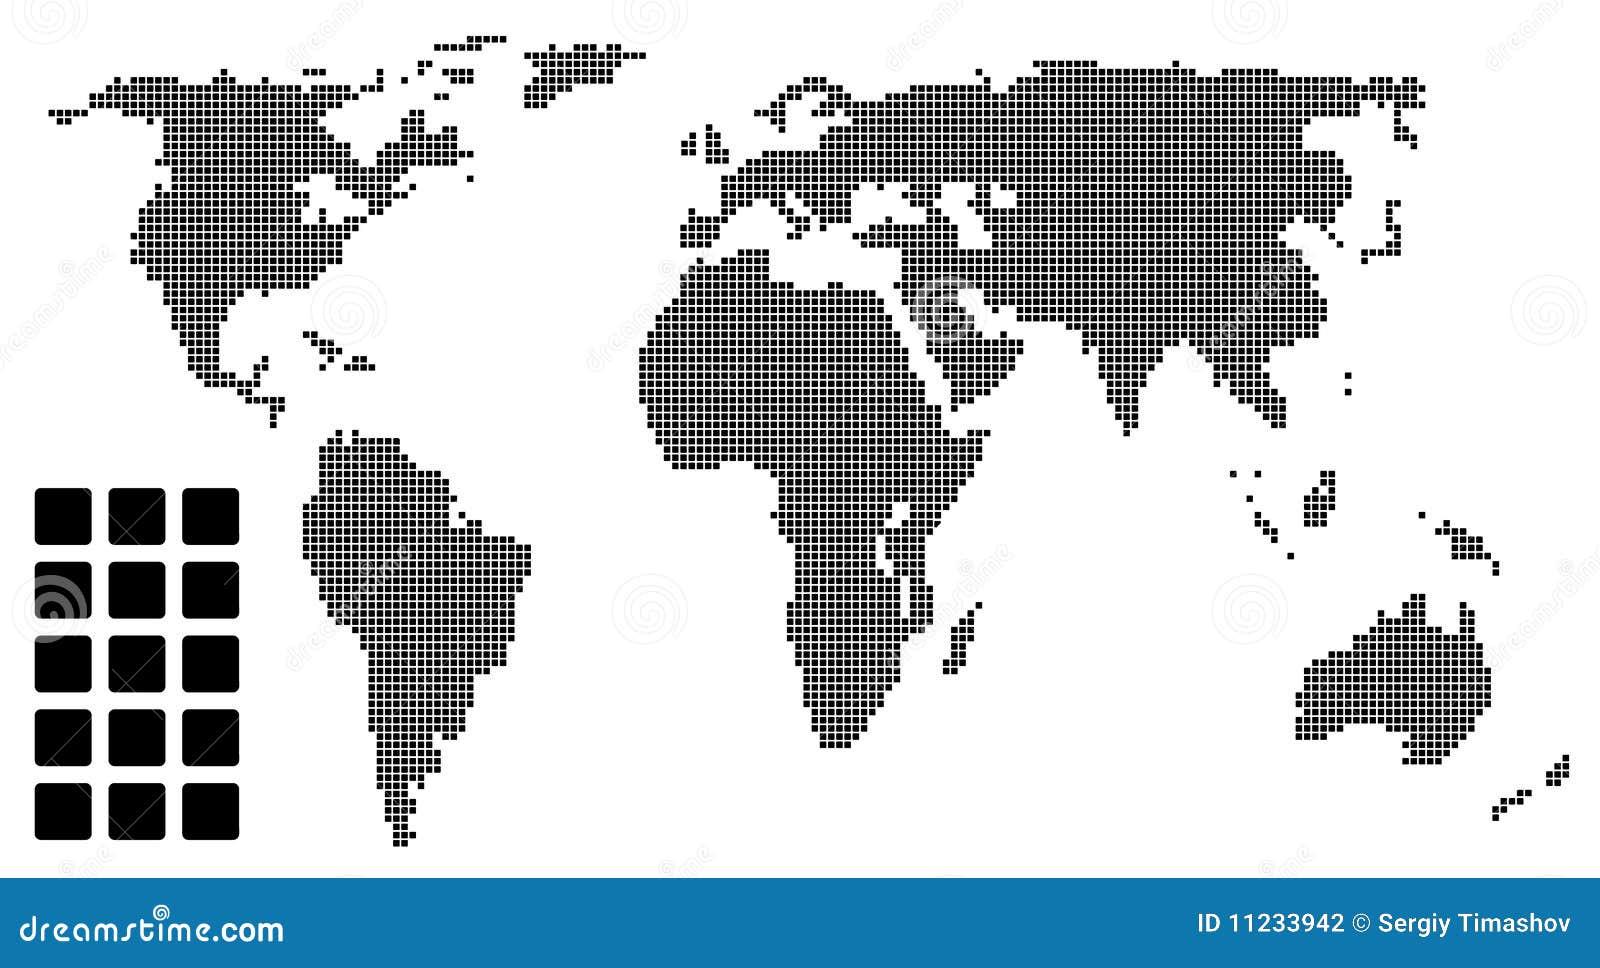 Pixel world map stock illustrations 1155 pixel world map stock vector pixel world map easy to edit publicscrutiny Choice Image